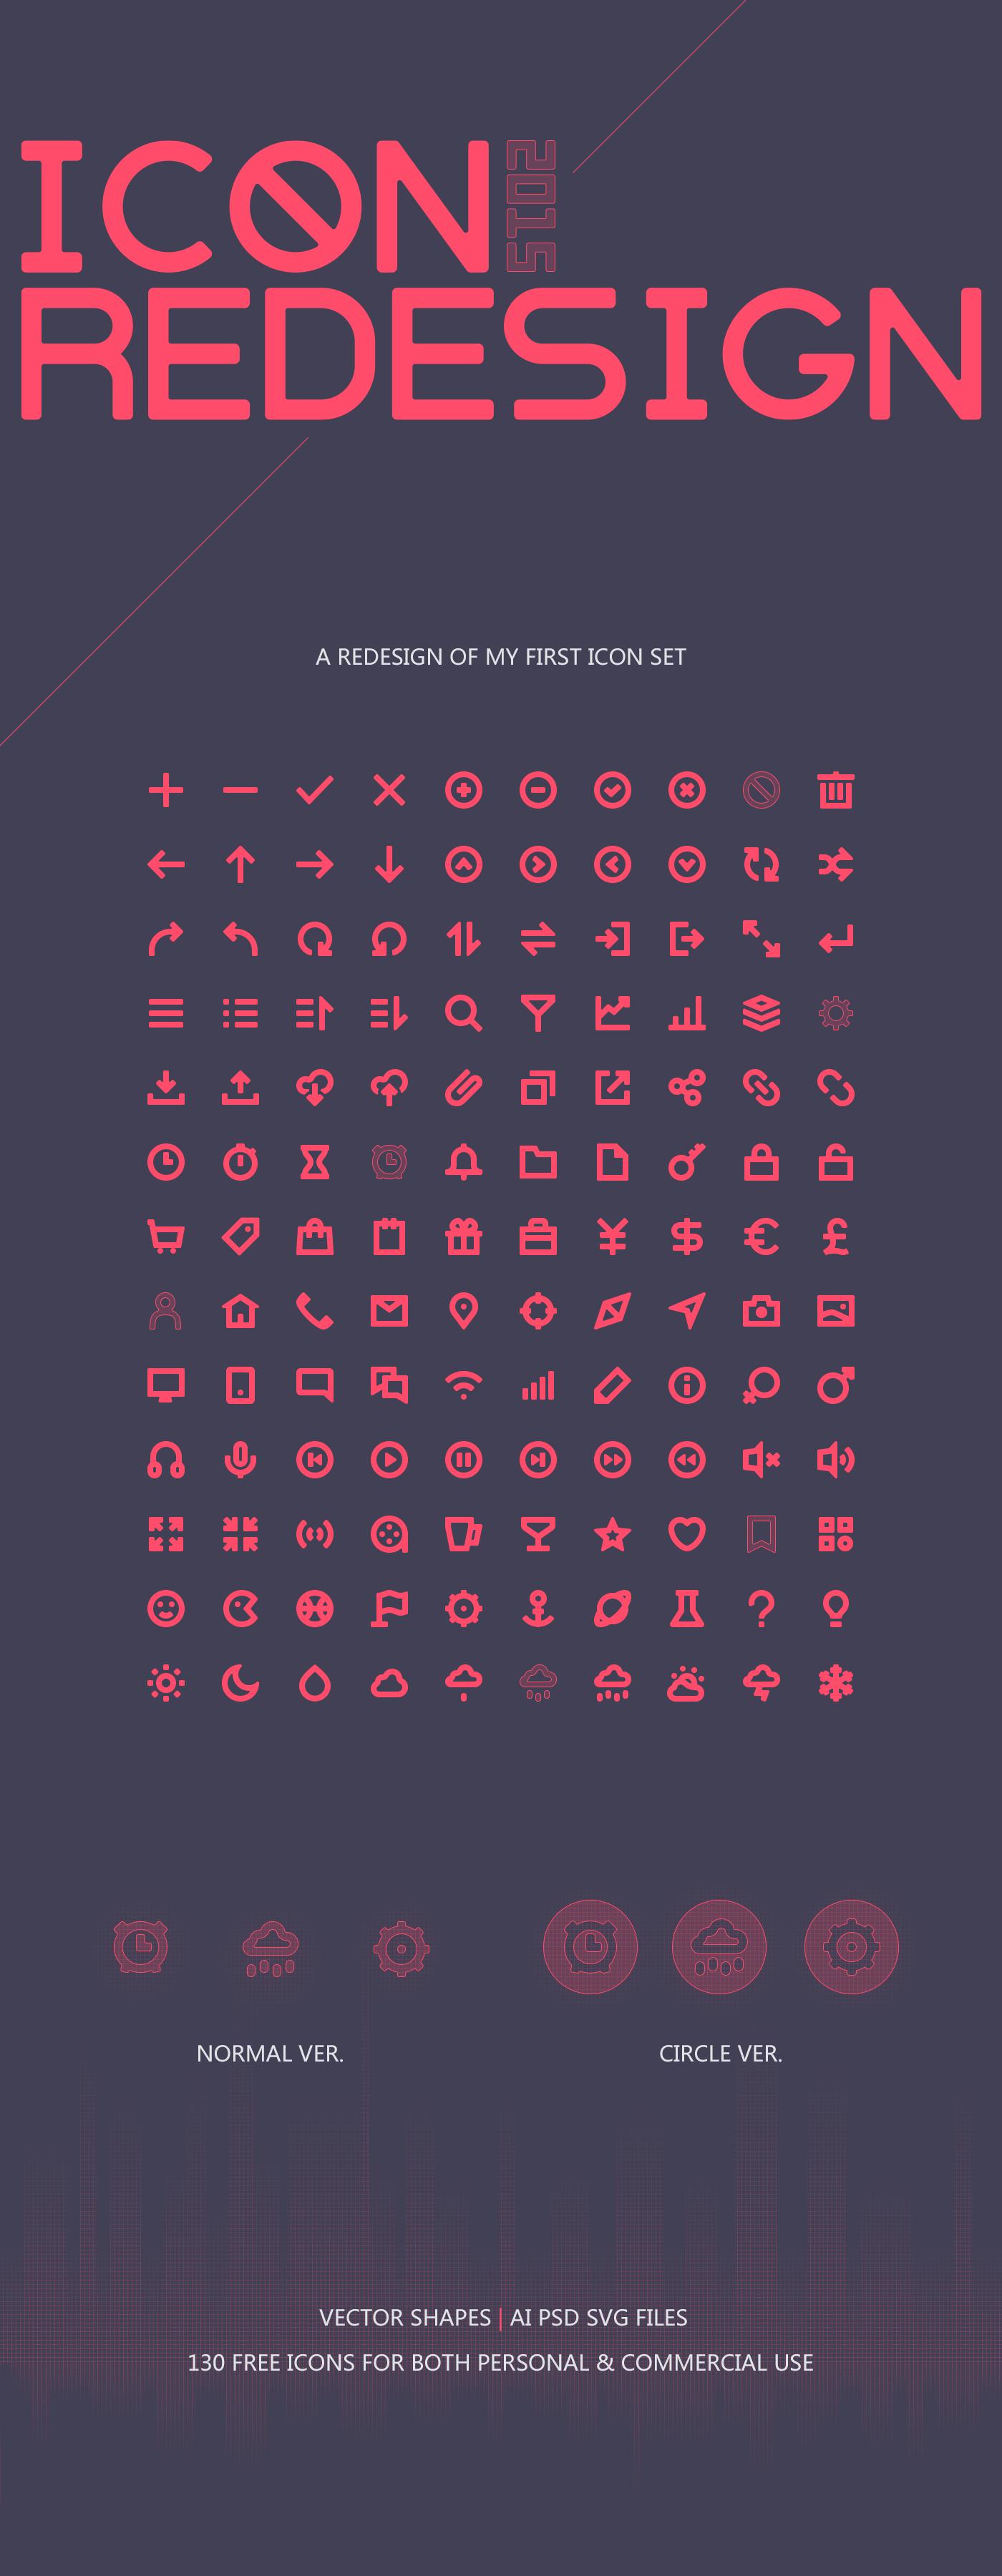 2015 Icon Redesgin on Behance